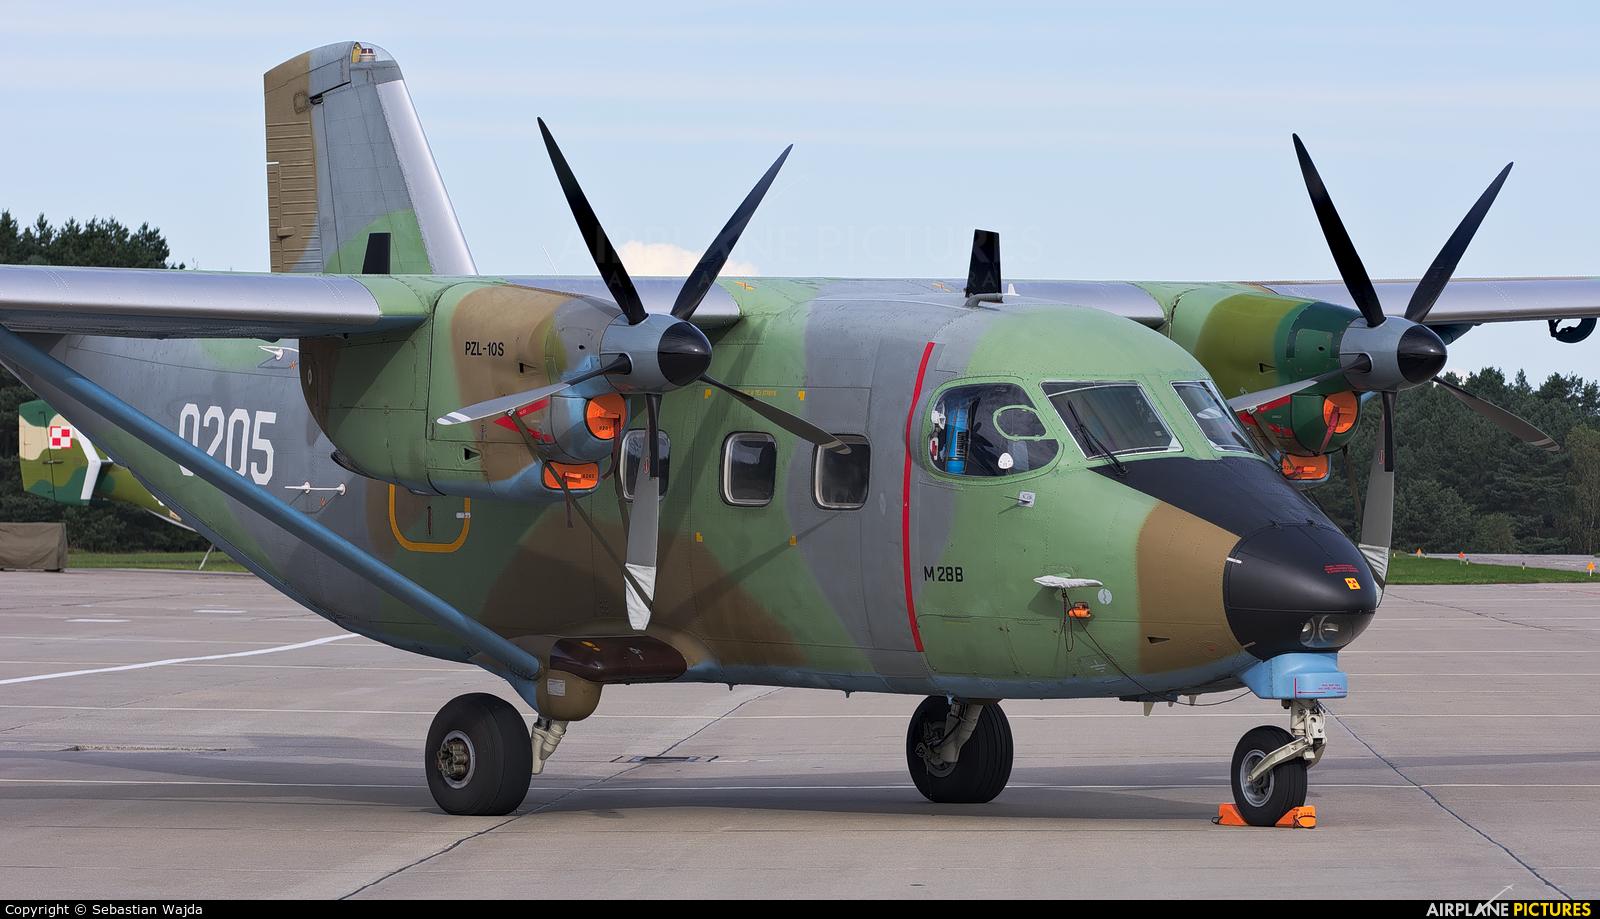 Poland - Air Force 0205 aircraft at Mirosławiec